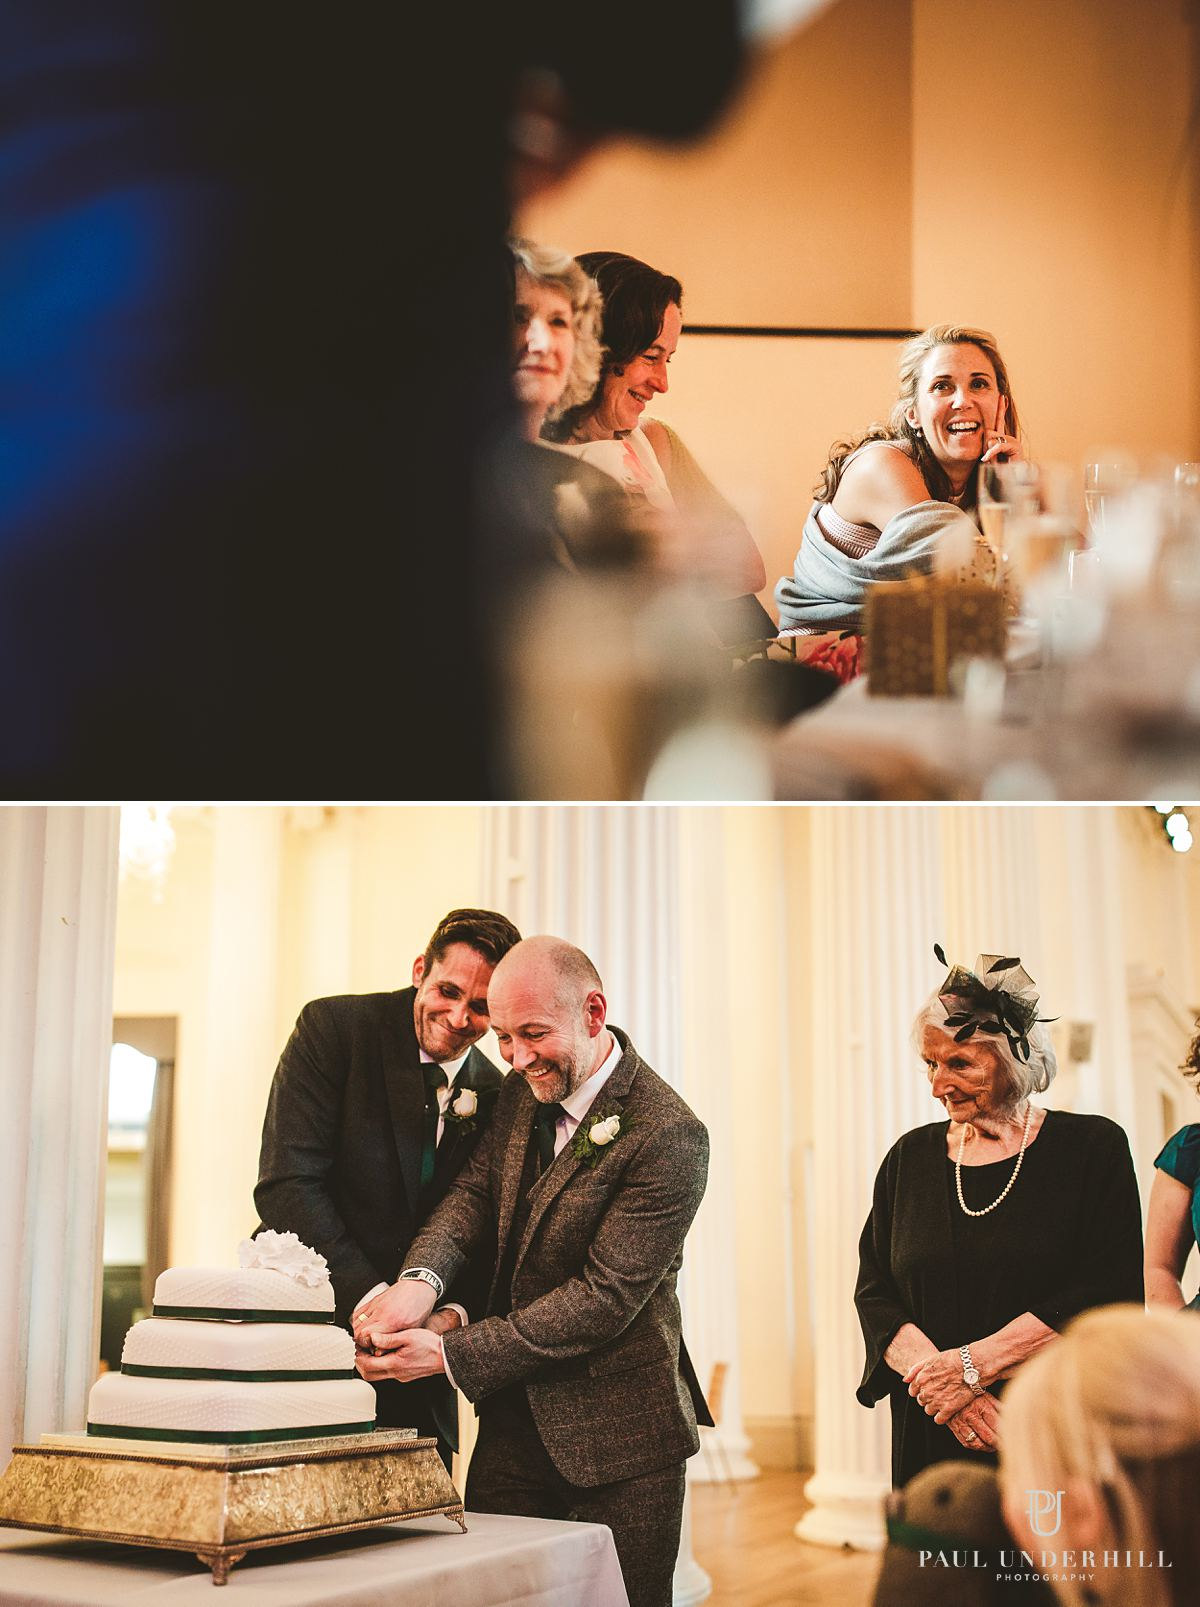 Wedding documentary photography speeches